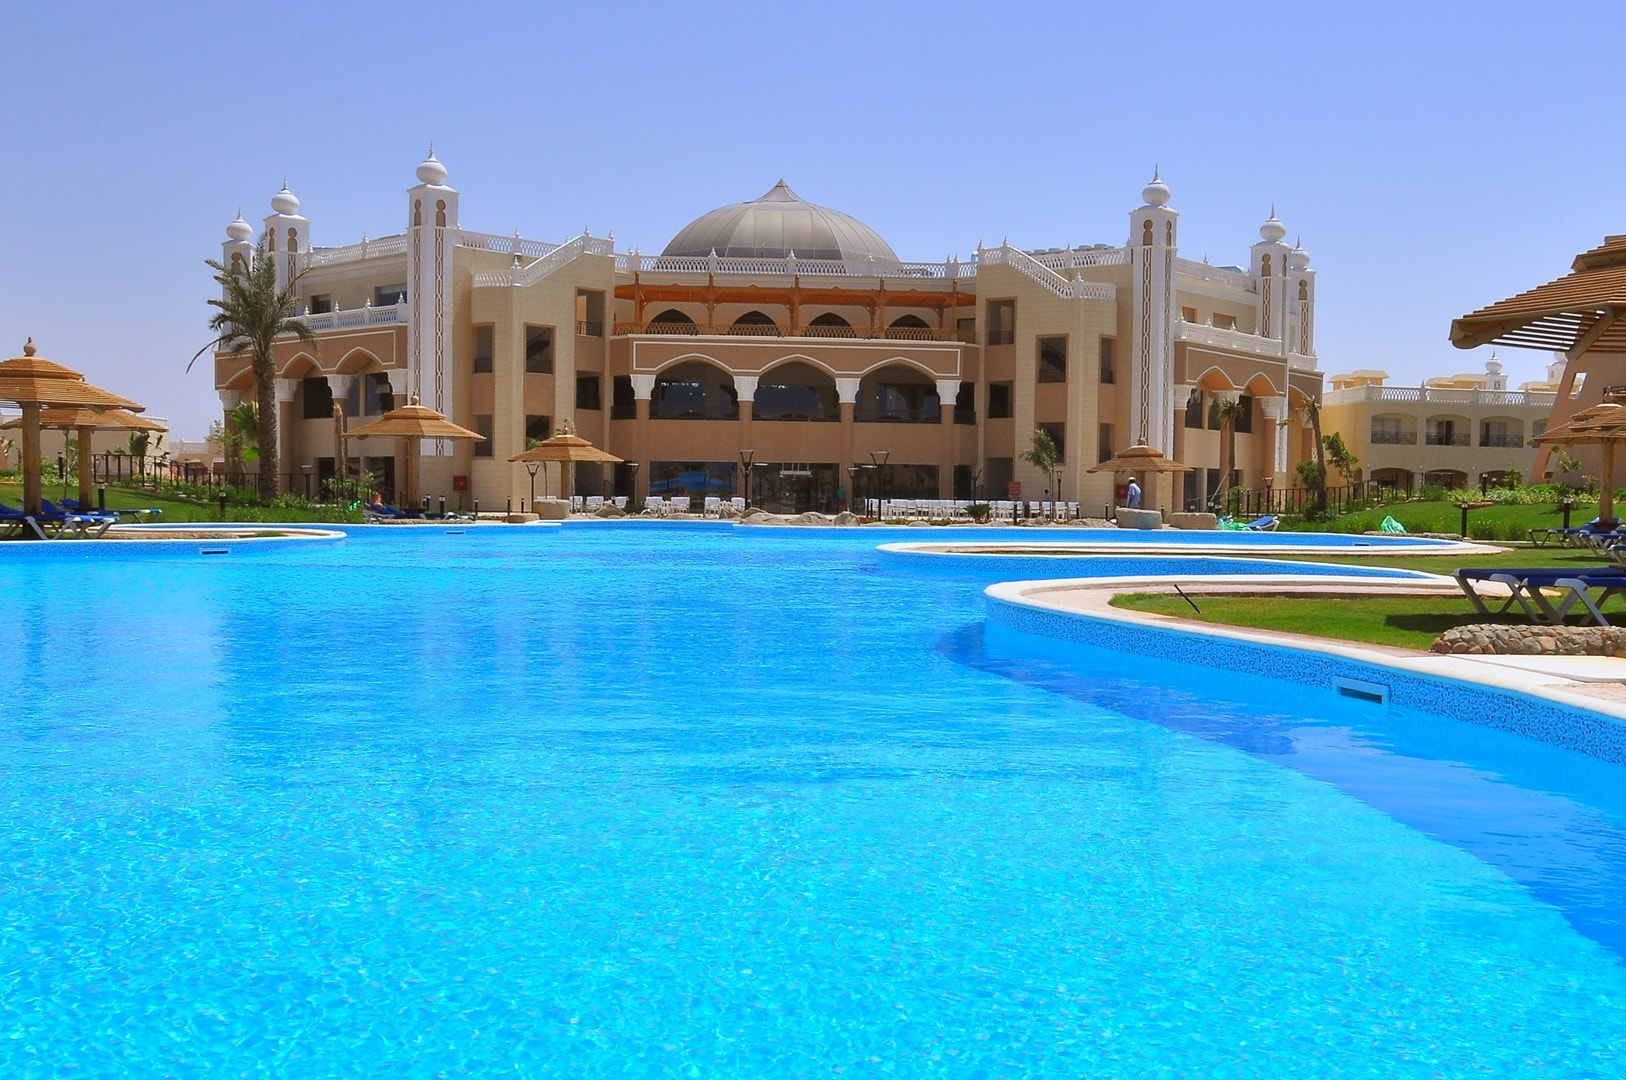 Ceļojums uz Ēģipti (Hurgada), Jasmine Palace Hurghada 5*